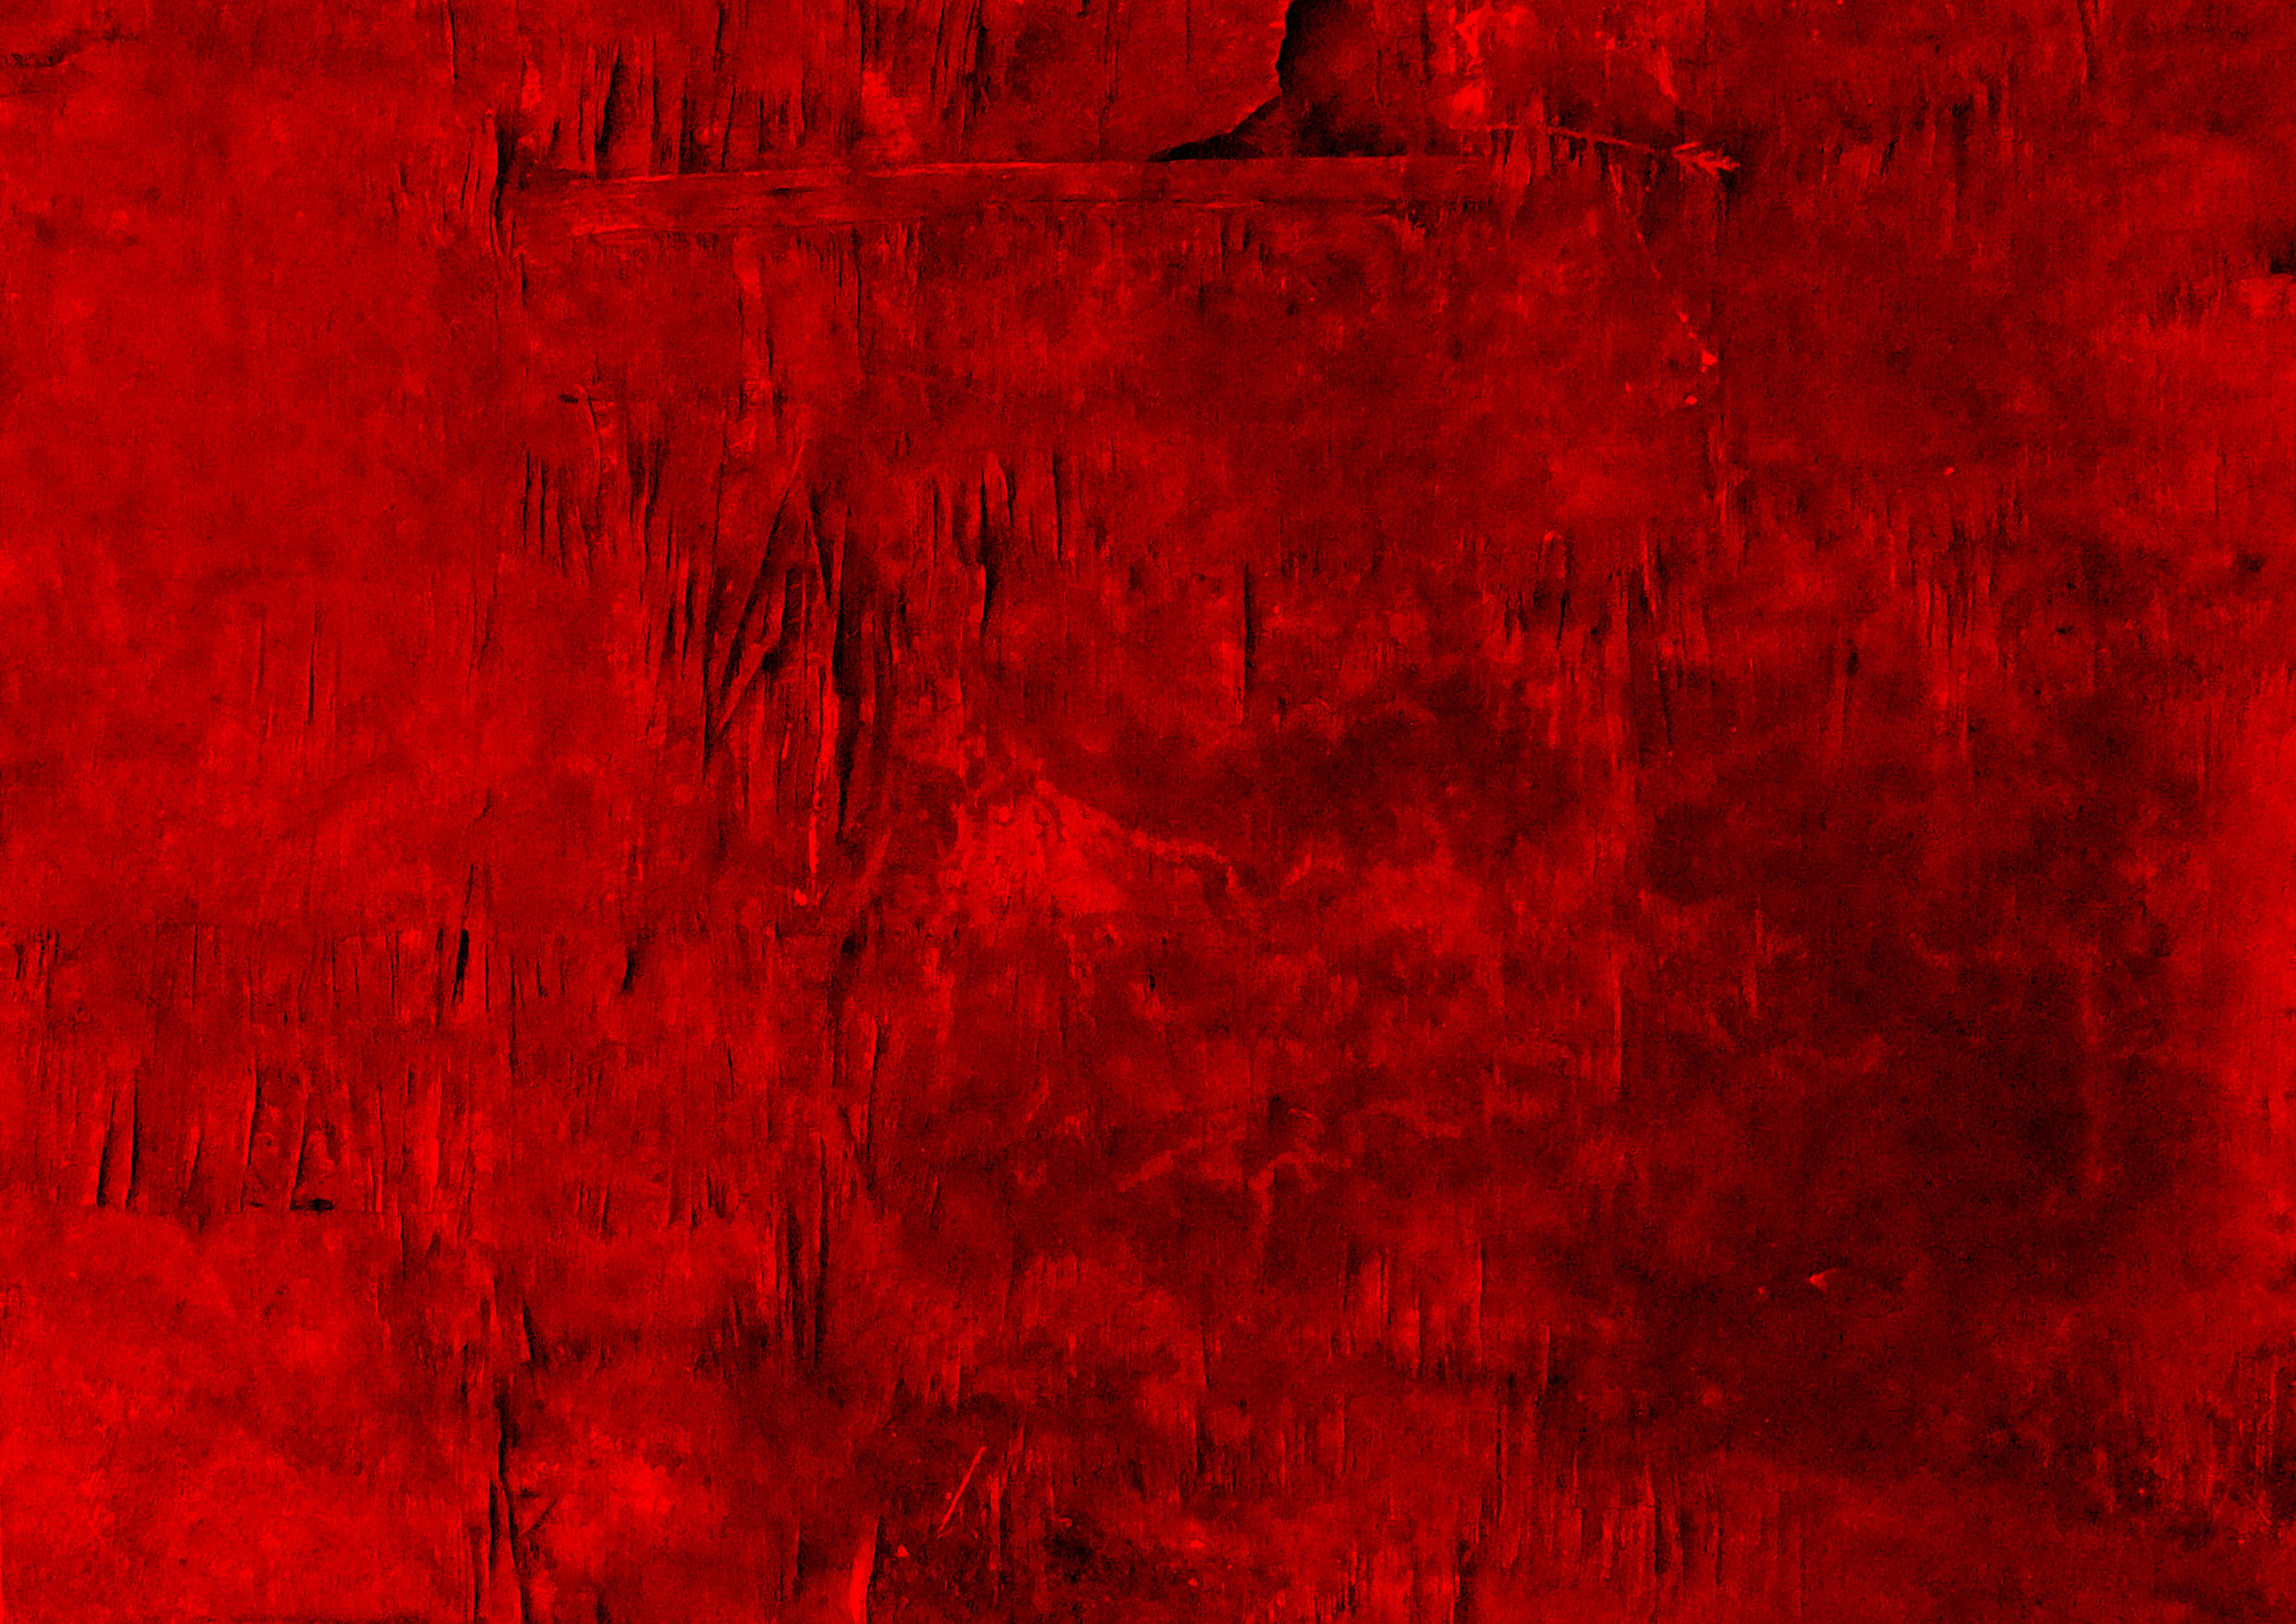 red grunge wallpaper displaying 15 images for red grunge wallpaper 4961x3508